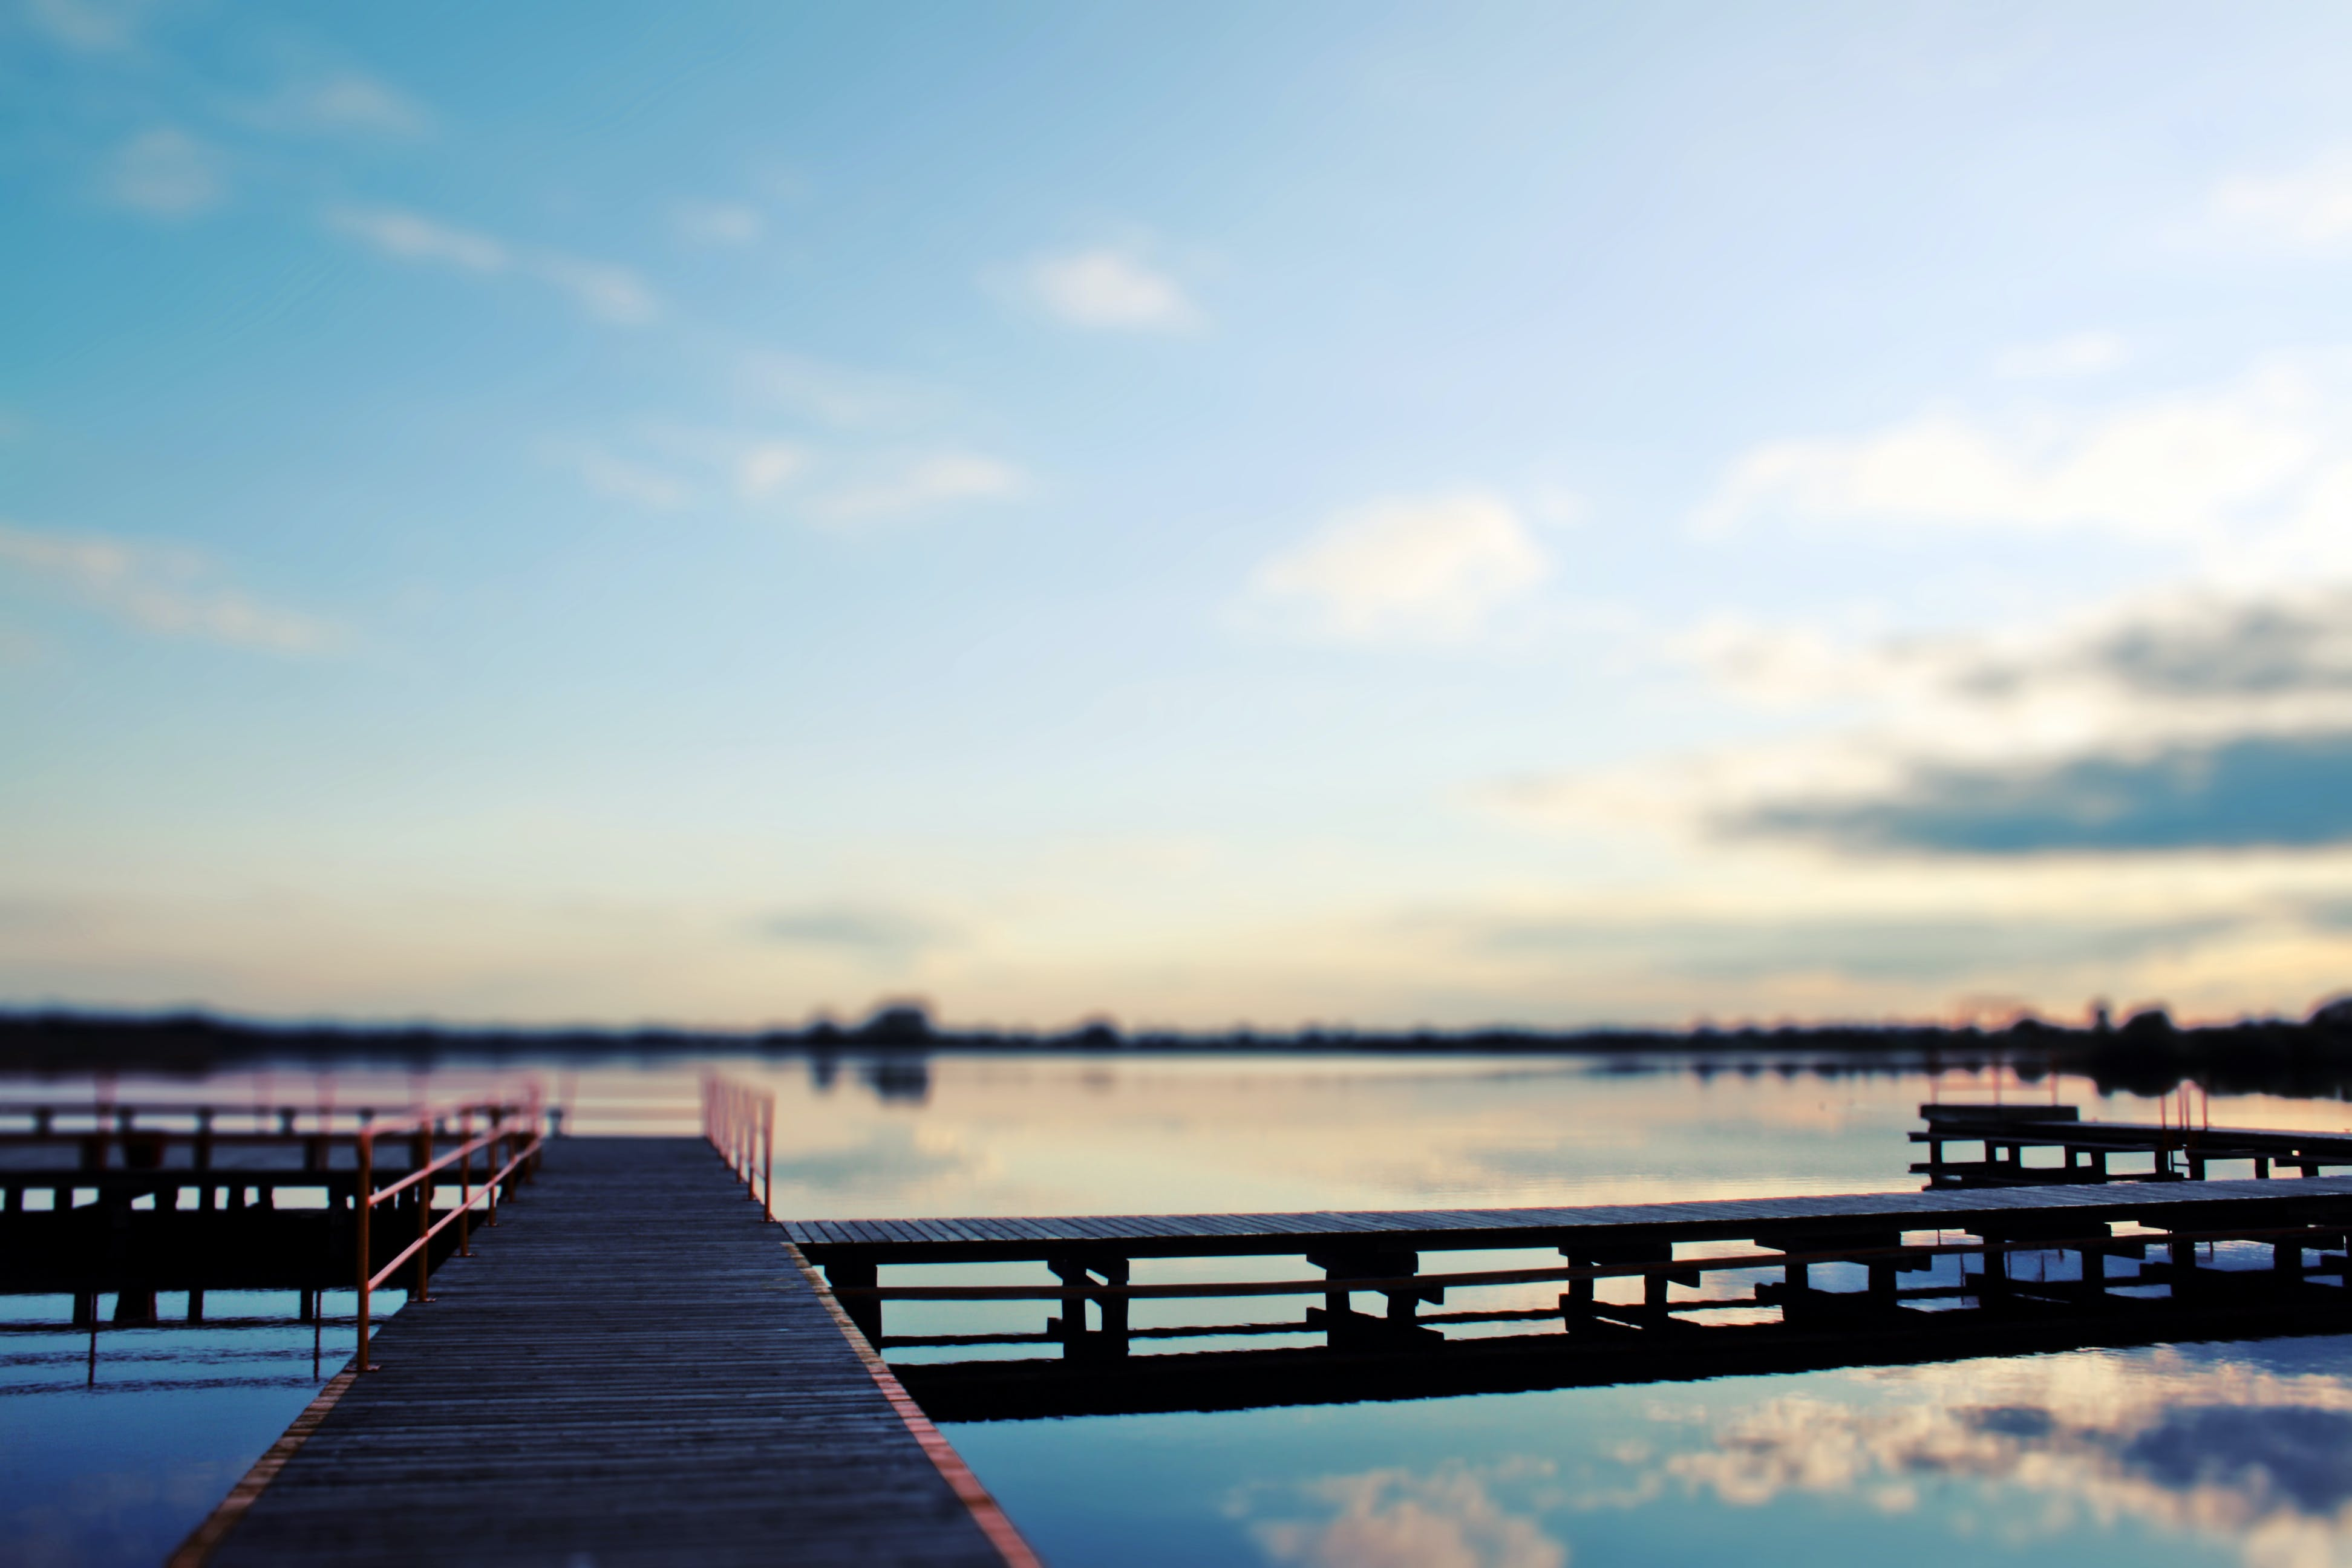 Bridge lake